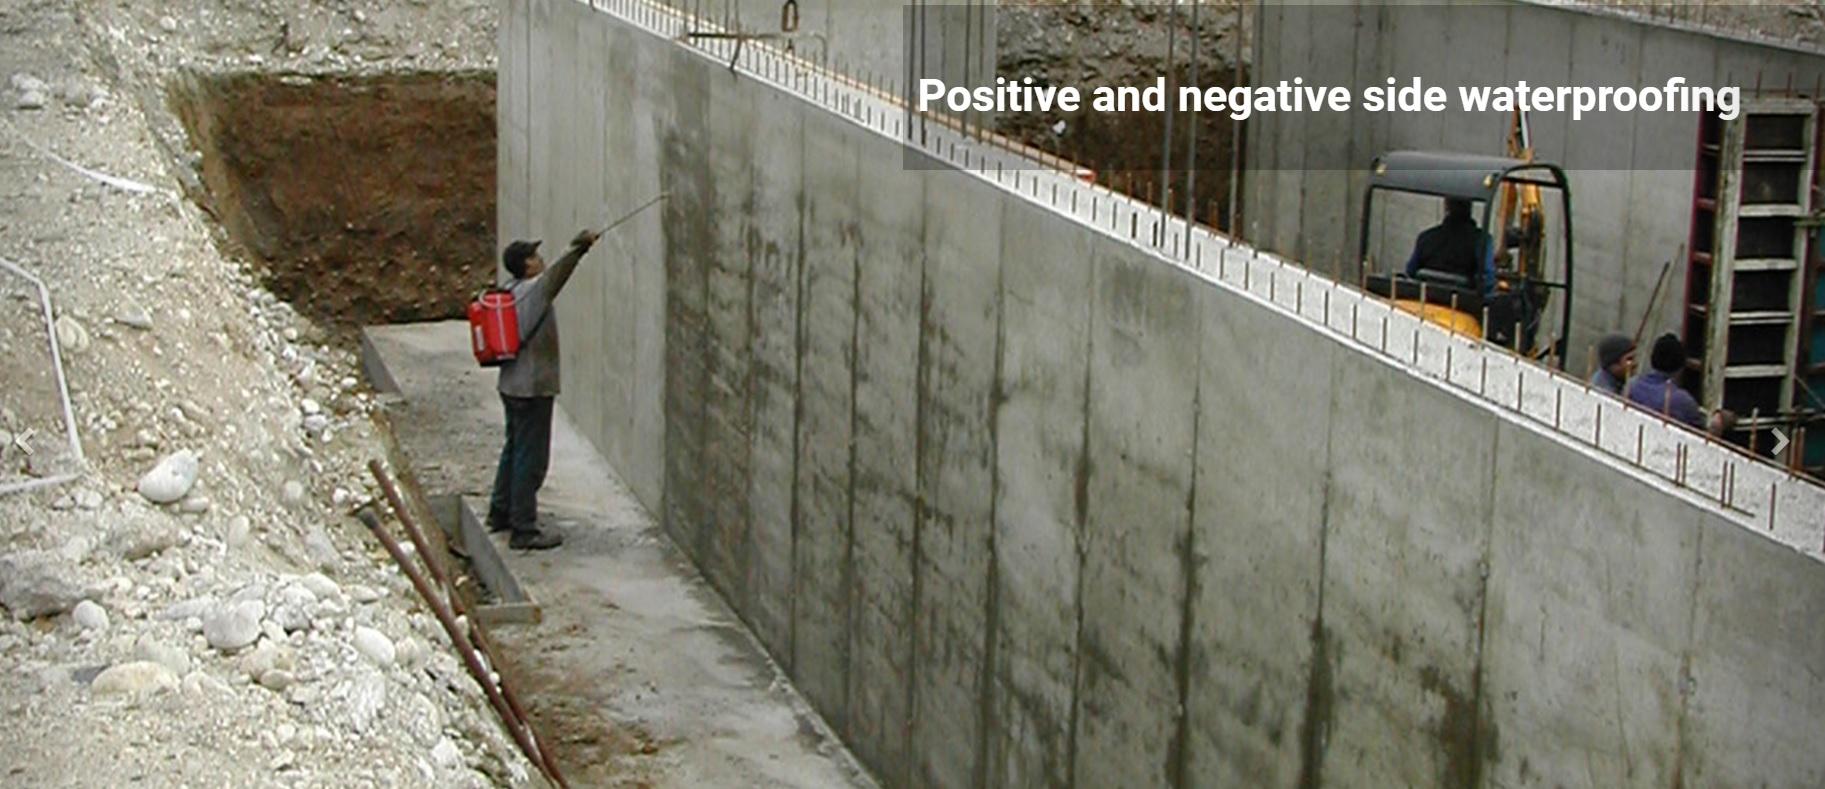 Impermeabilización de muros de sótano mediante nanocristalización